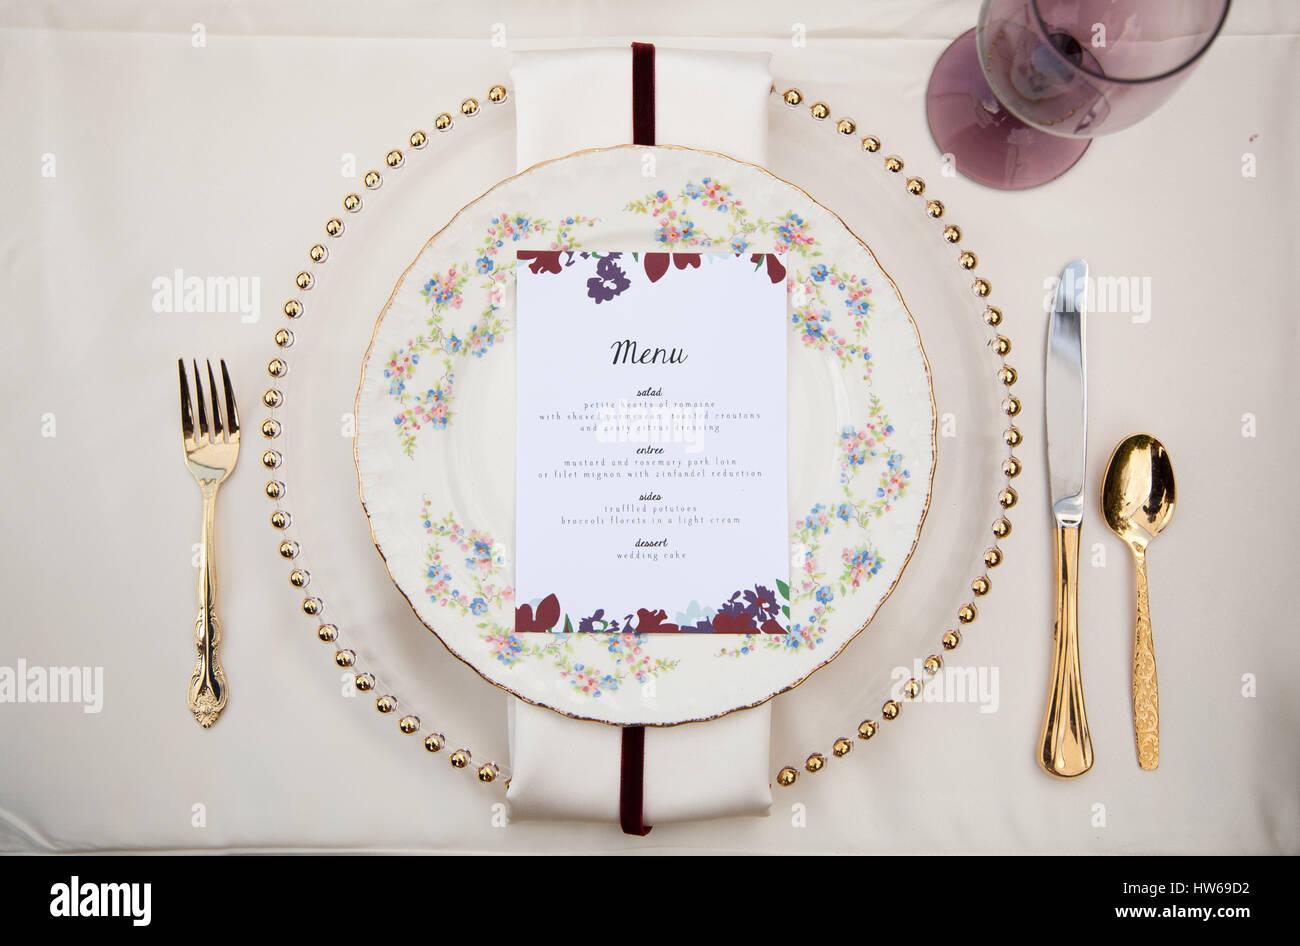 Reception menu - Stock Image